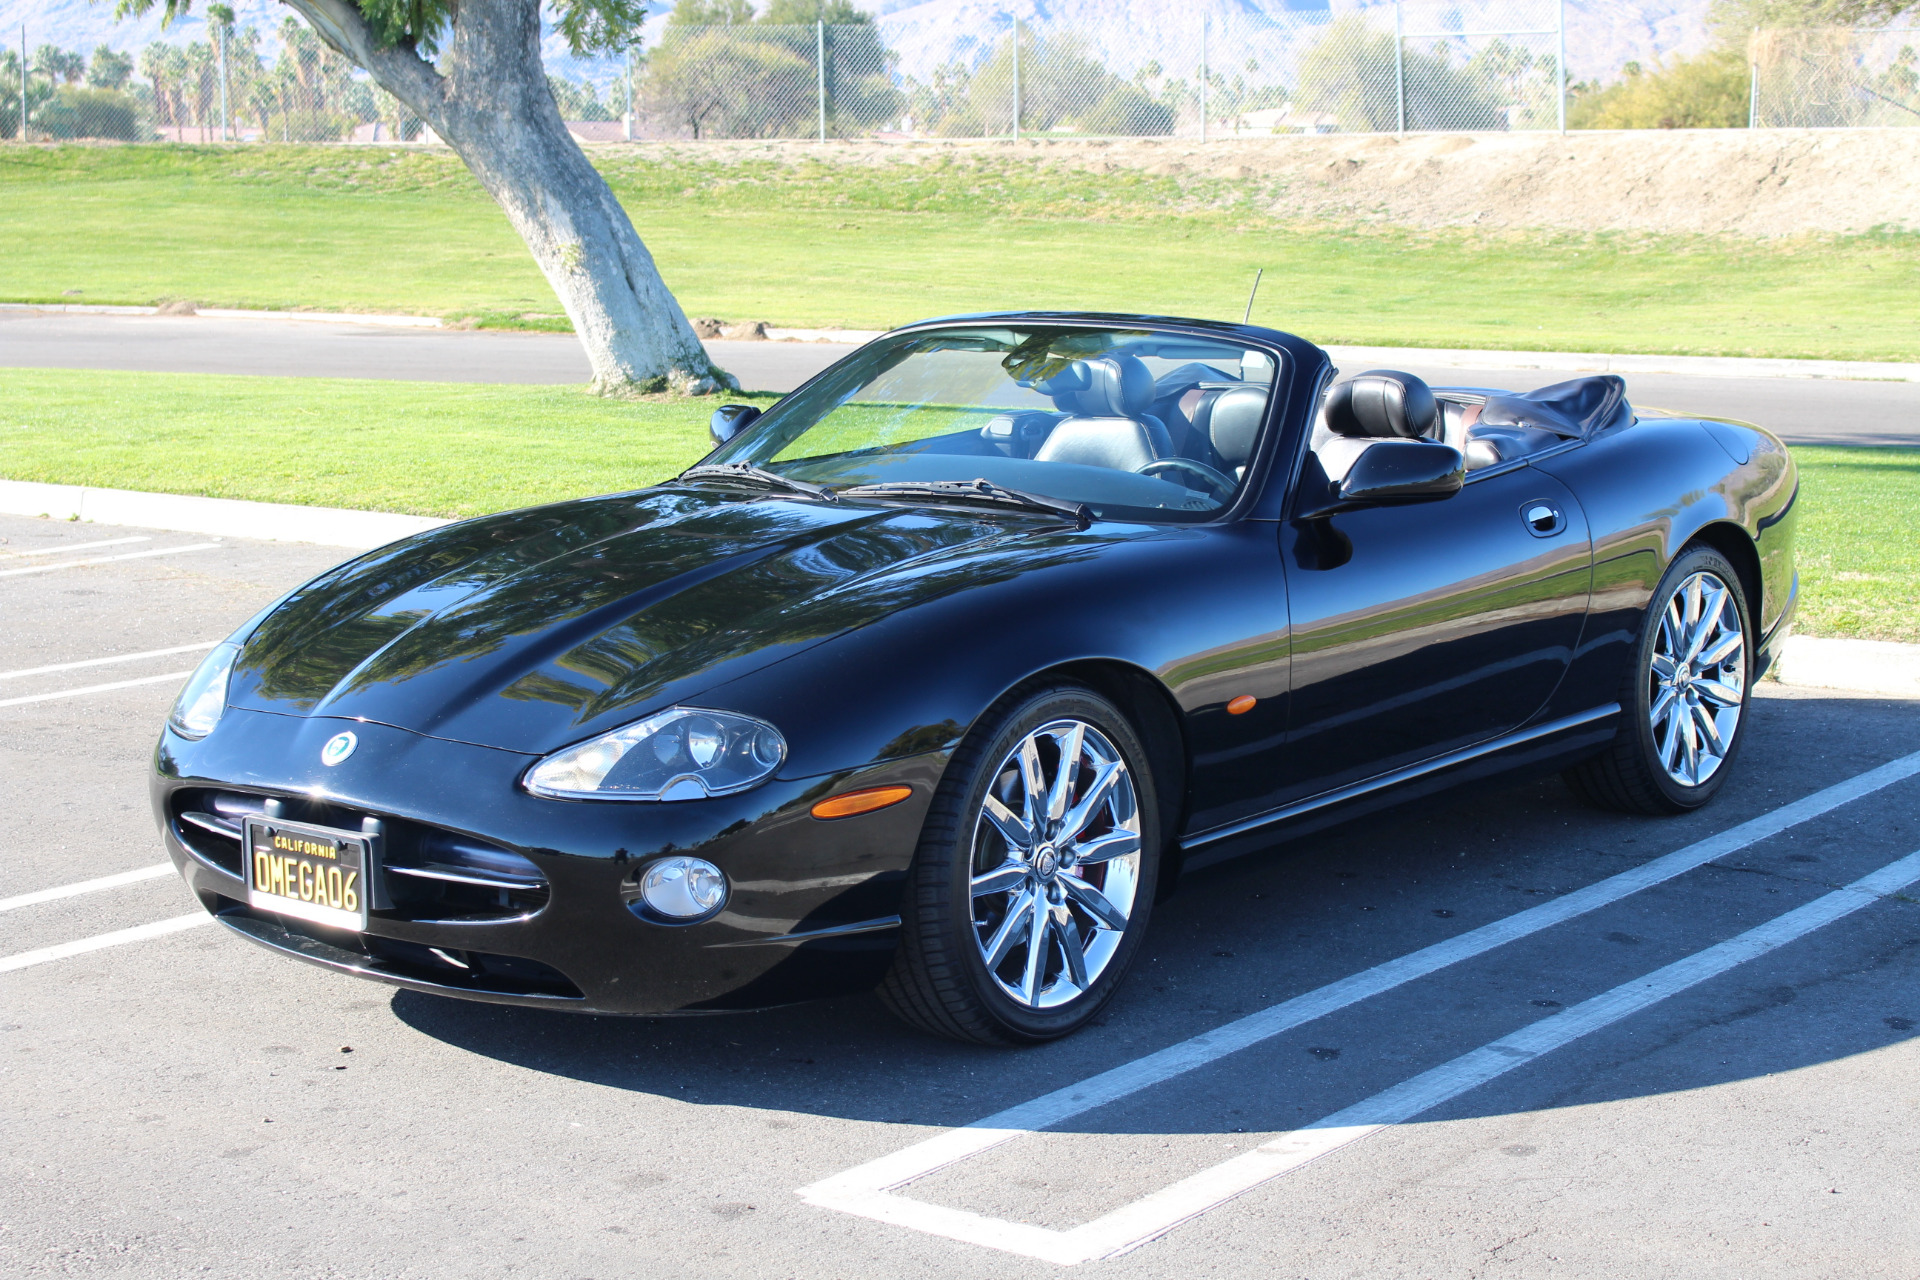 2006 Jaguar XK-Series Victory Edition XK8 Stock # JO261 for sale near Palm Springs, CA | CA ...